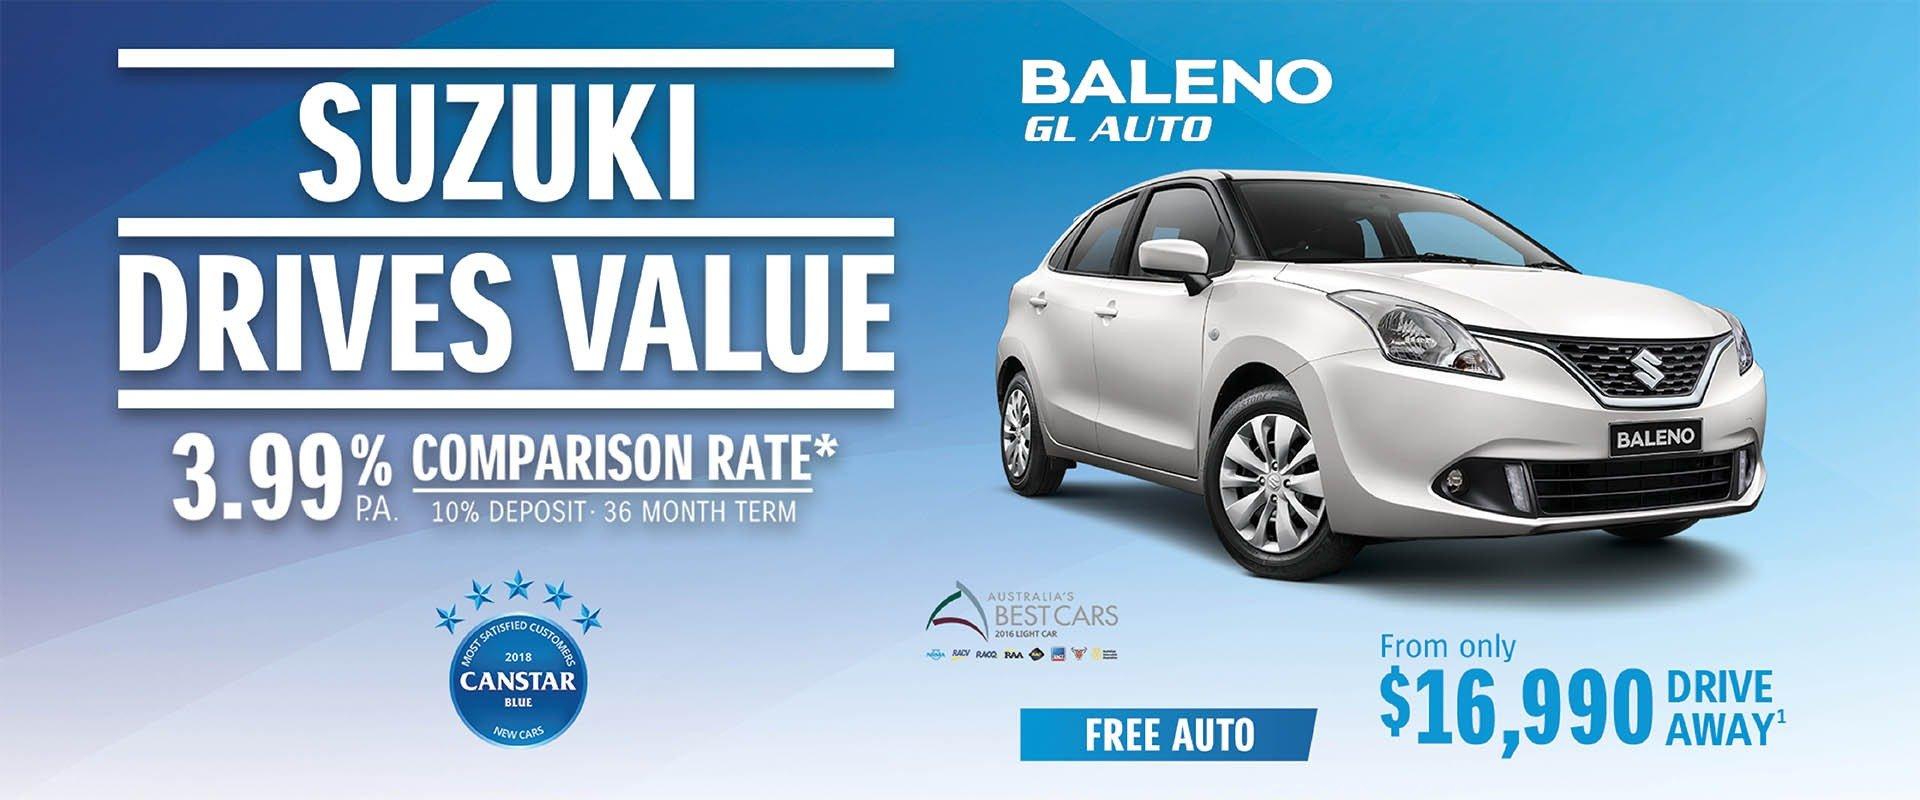 Suzuki Drives Value - Baleno GL Auto